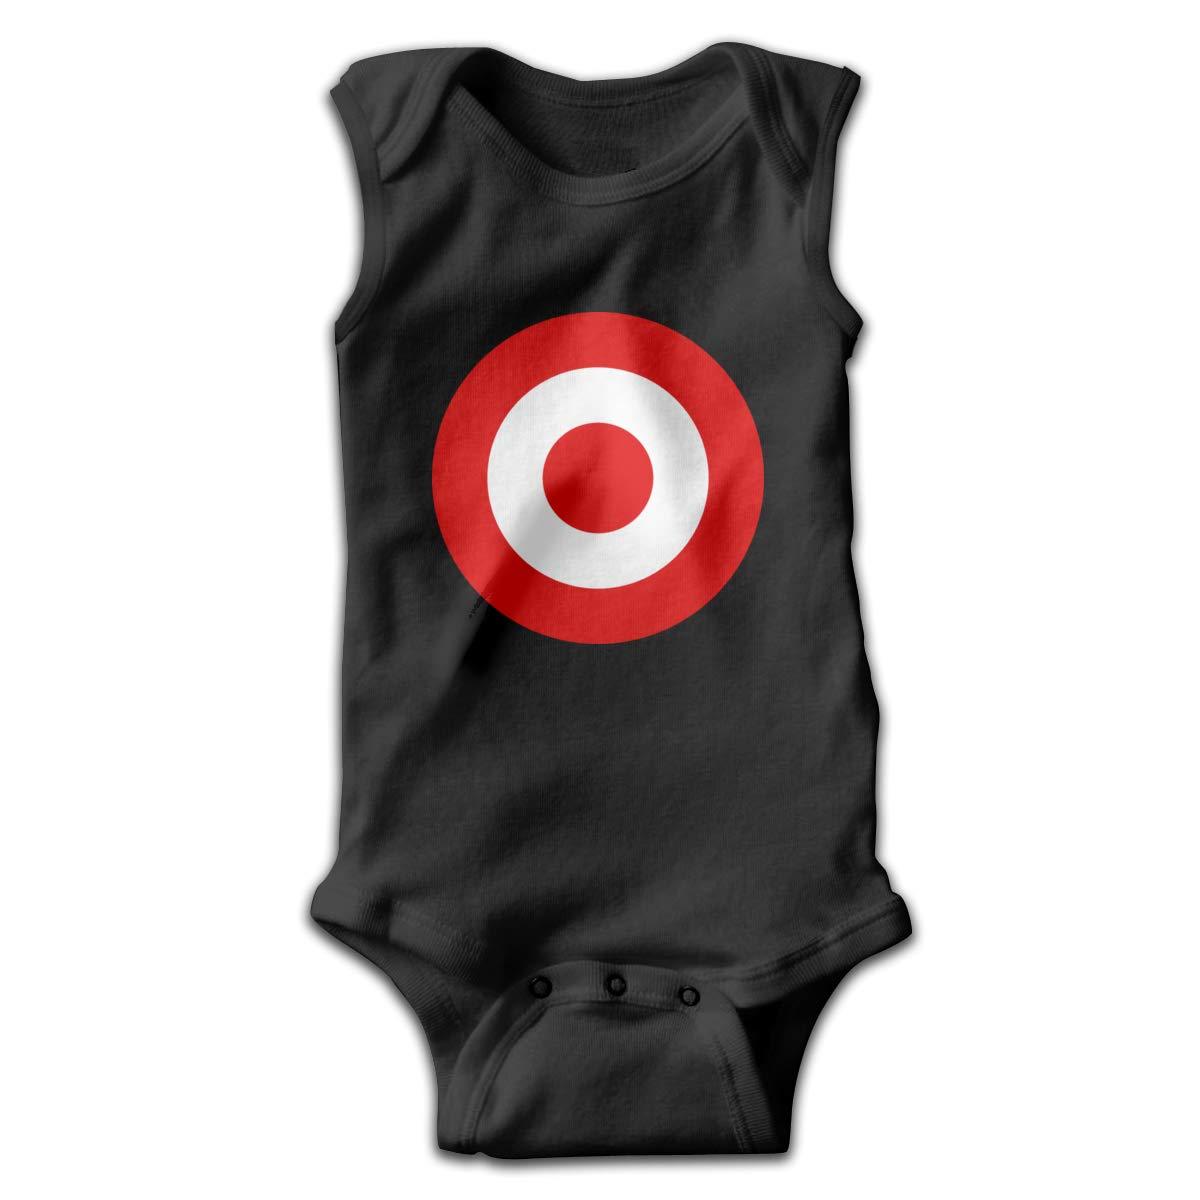 e160b5895 Amazon.com: Red Target Bullseye Baby Girls Sleeveless Onesies Infant:  Clothing